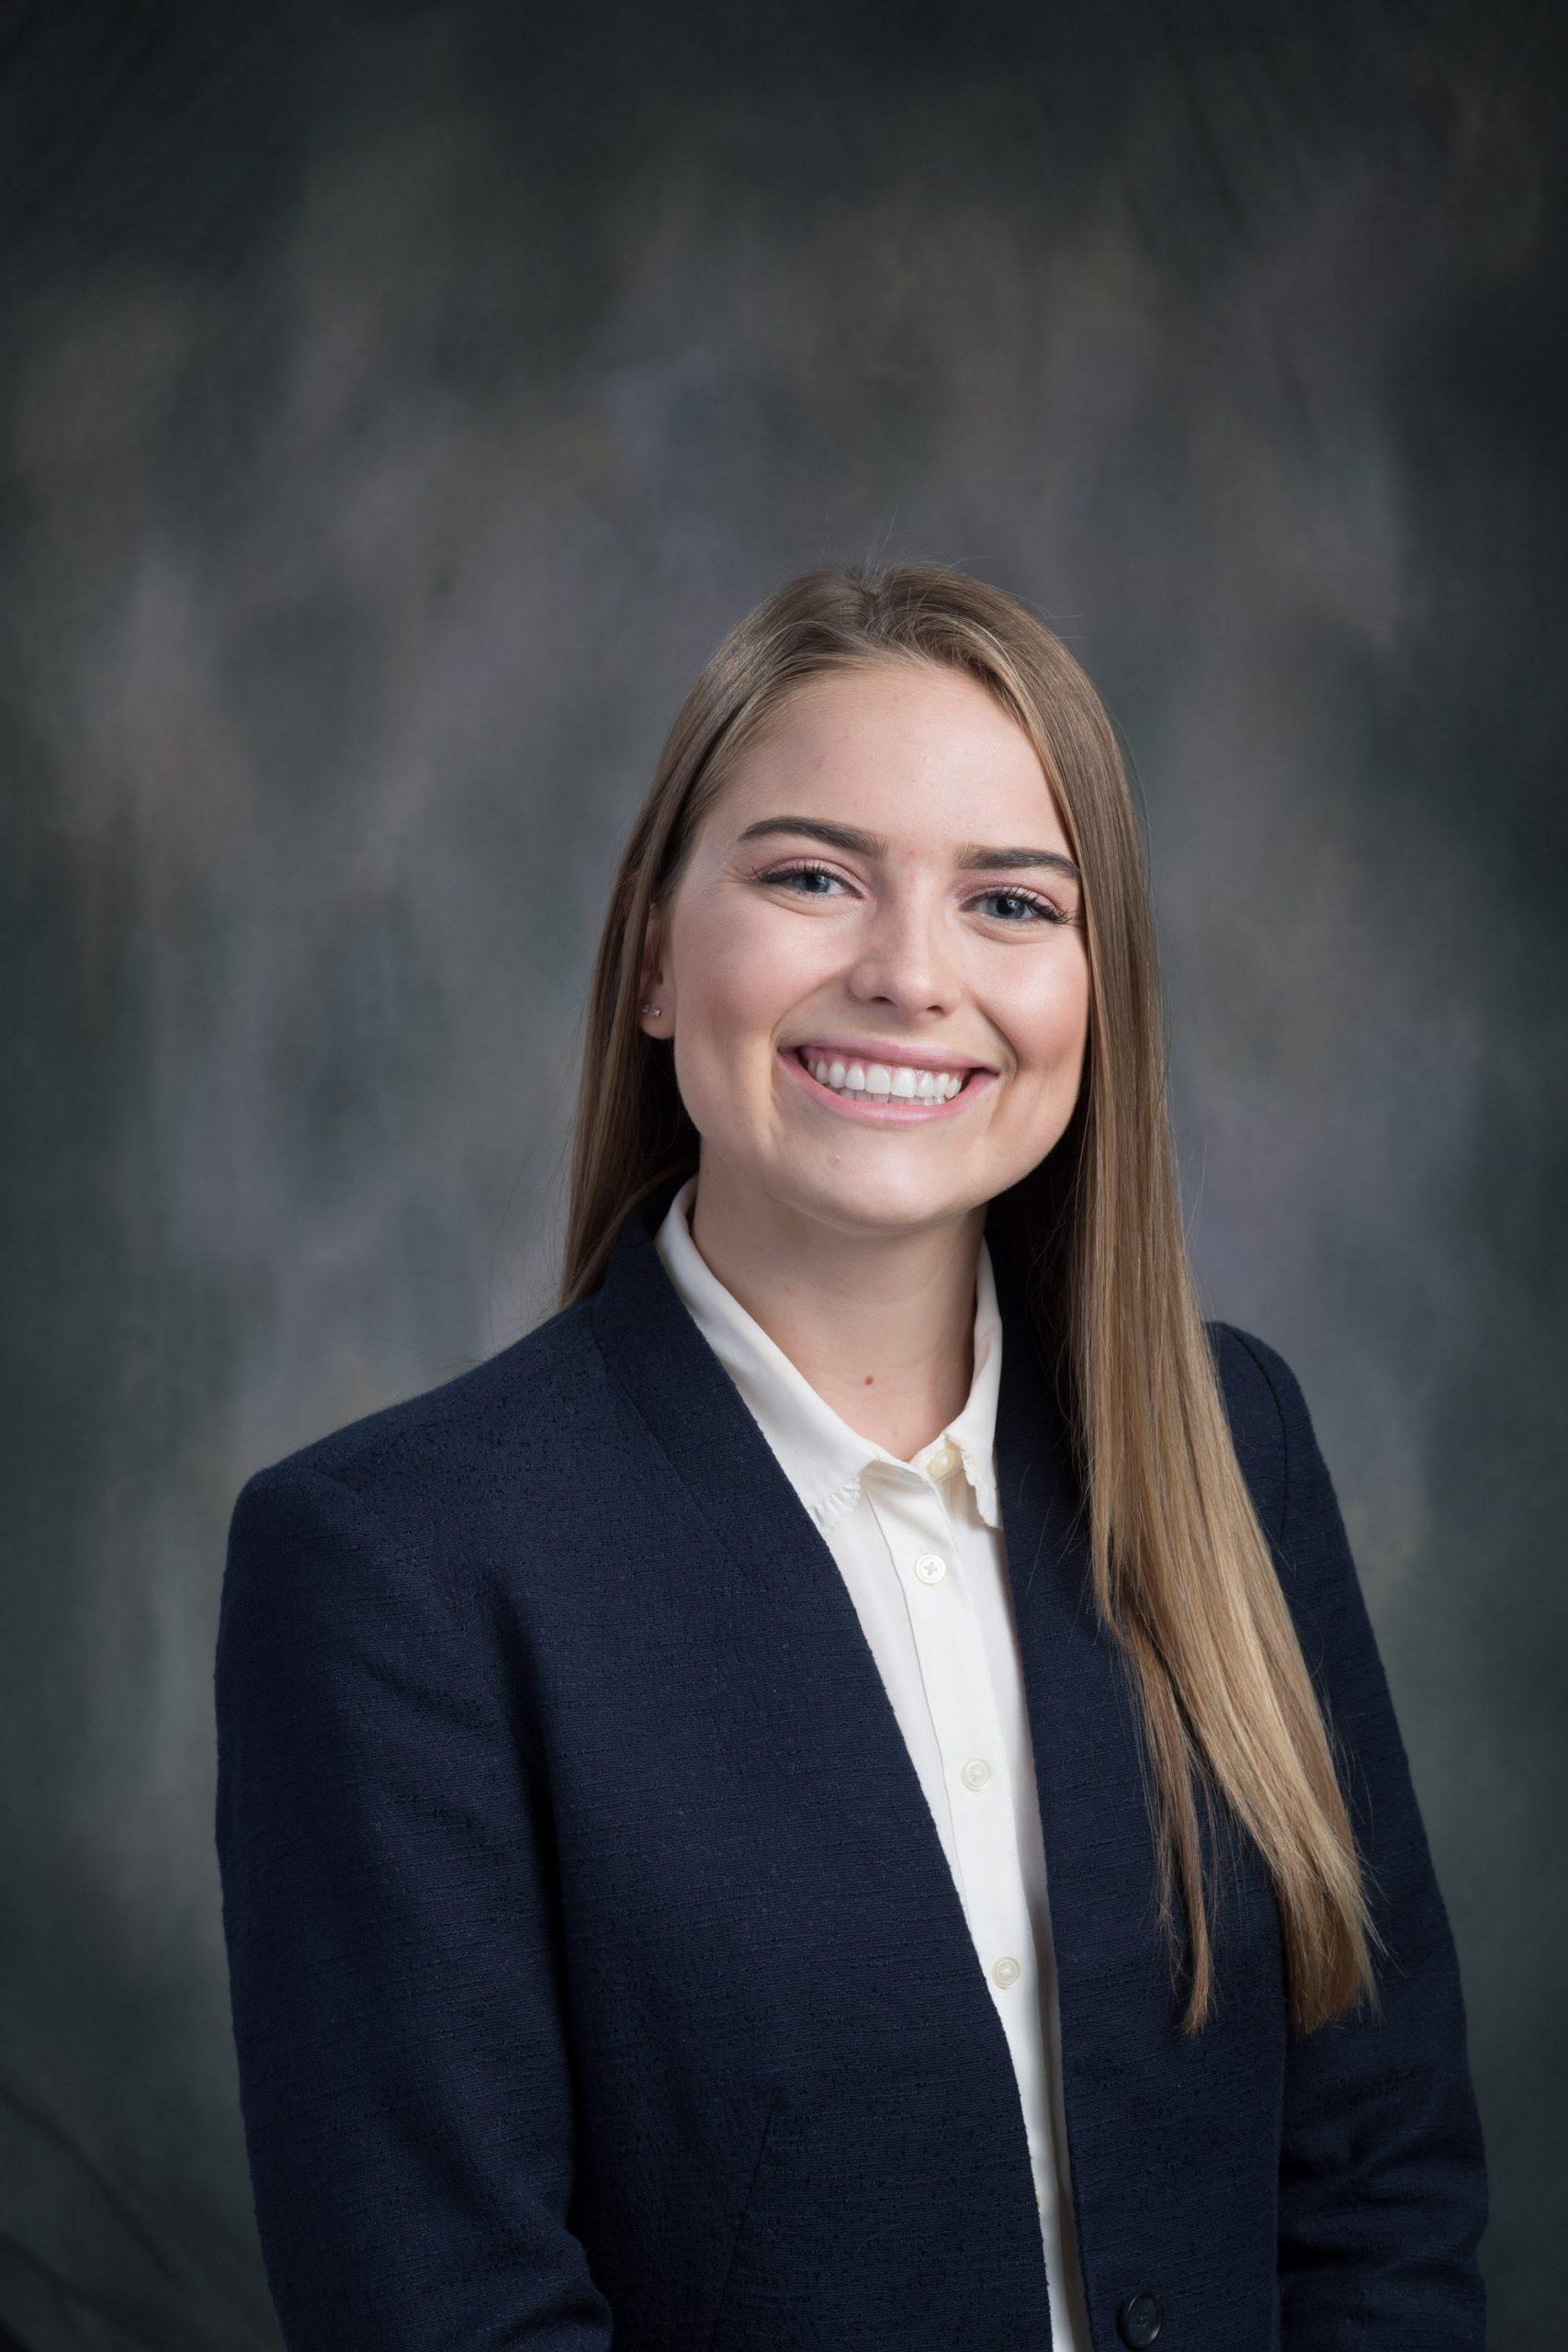 2020 US Army Women's Foundation 2020 Scholarship Recipient Nicole Stephens